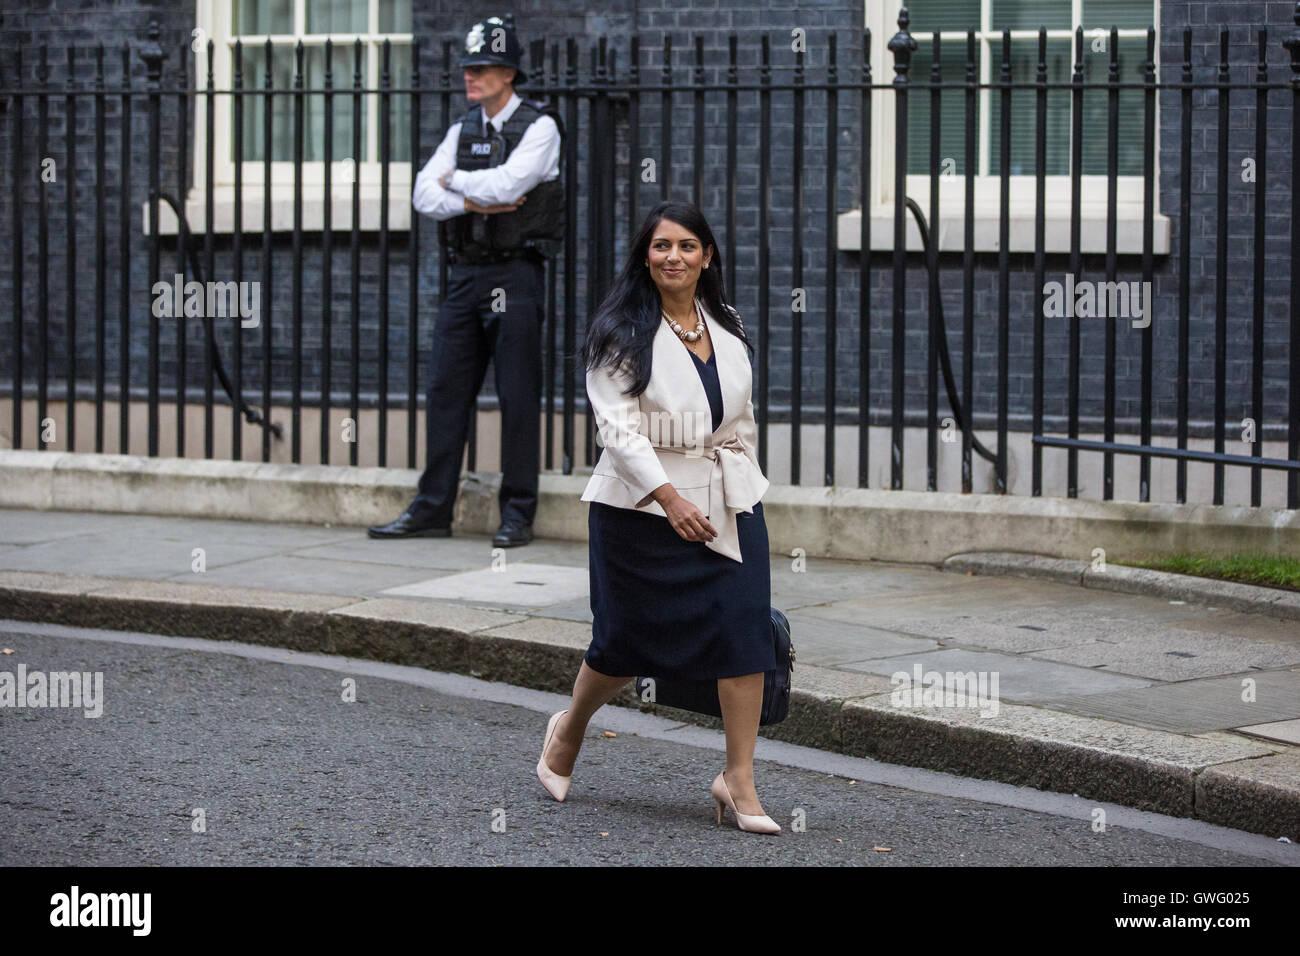 London, UK. 13th September, 2016. Priti Patel MP, Secretary of State for International Development, leaves Downing Street following a Cabinet meeting. Credit:  Mark Kerrison/Alamy Live News